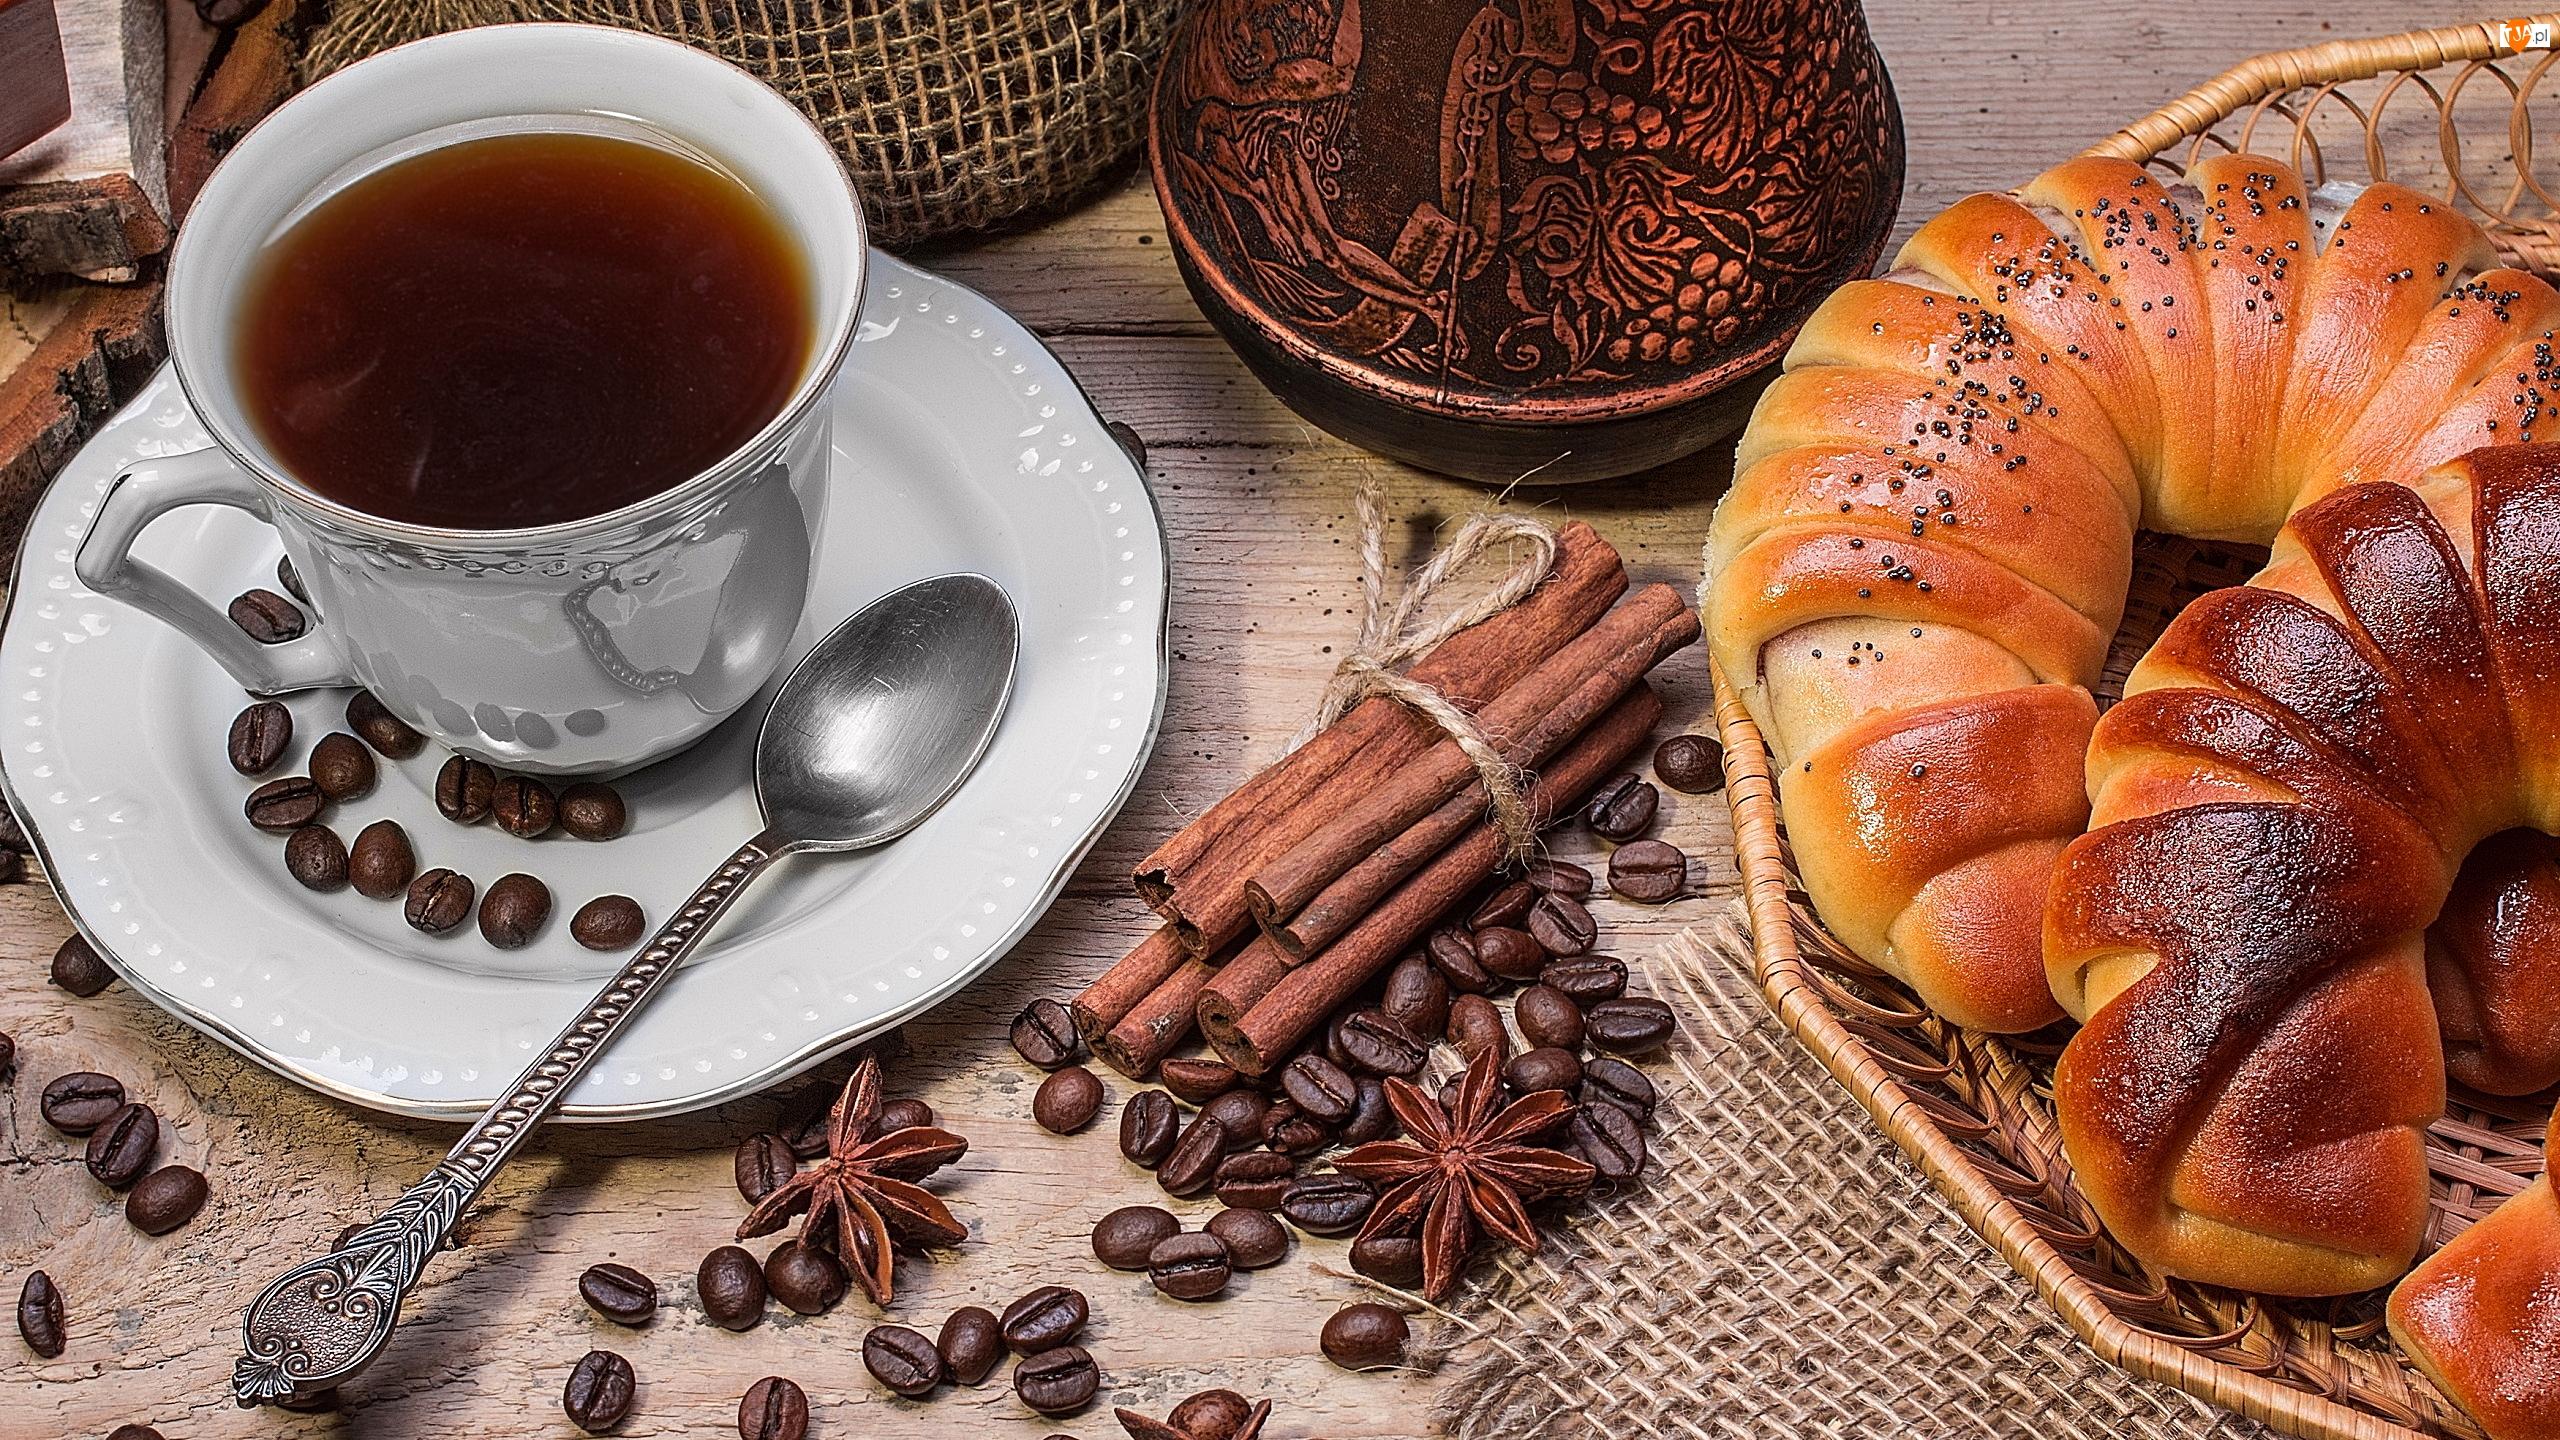 Filiżanka, Kawa, Anyż, Koszyk, Cynamon, Rogale